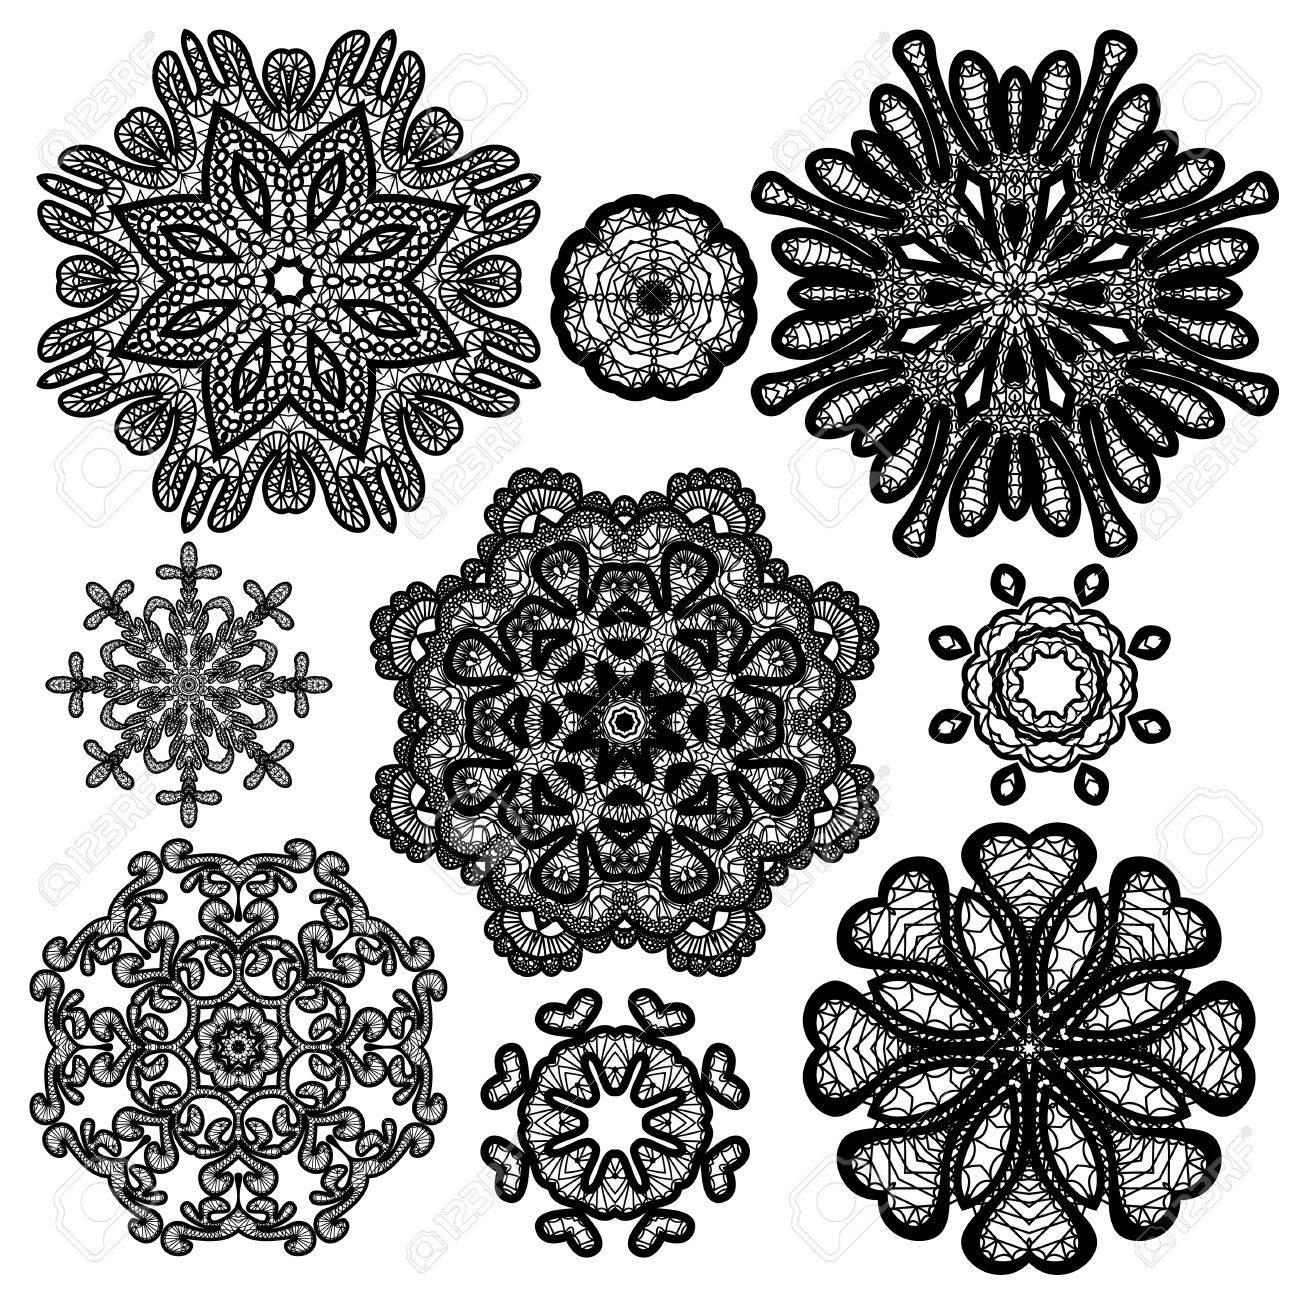 set of abstract circle lace patterns royalty free cliparts vectors